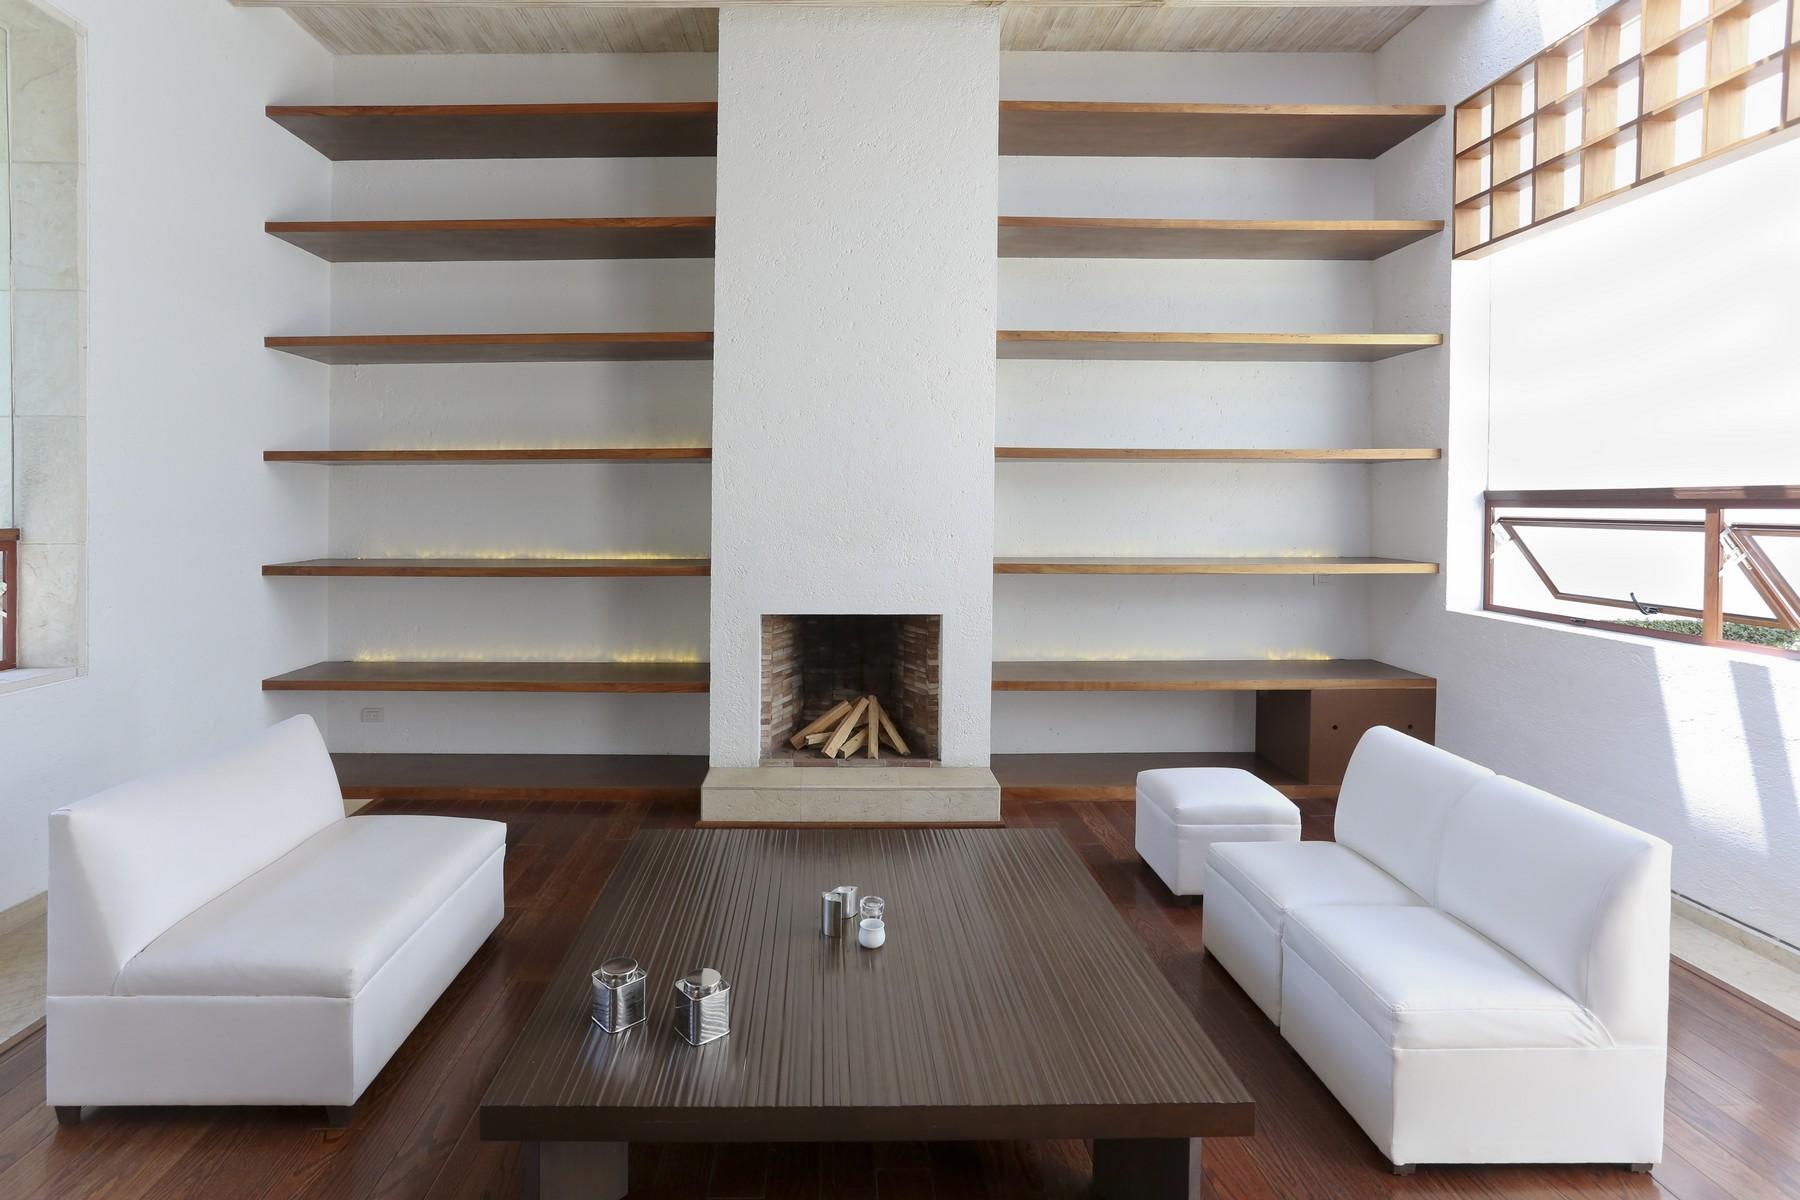 Additional photo for property listing at Avandaro Residence at Valle de Bravo Fontana Bella 162, Avandaro, Valle de Bravo Federal District, Mexico Df 51200 Mexico